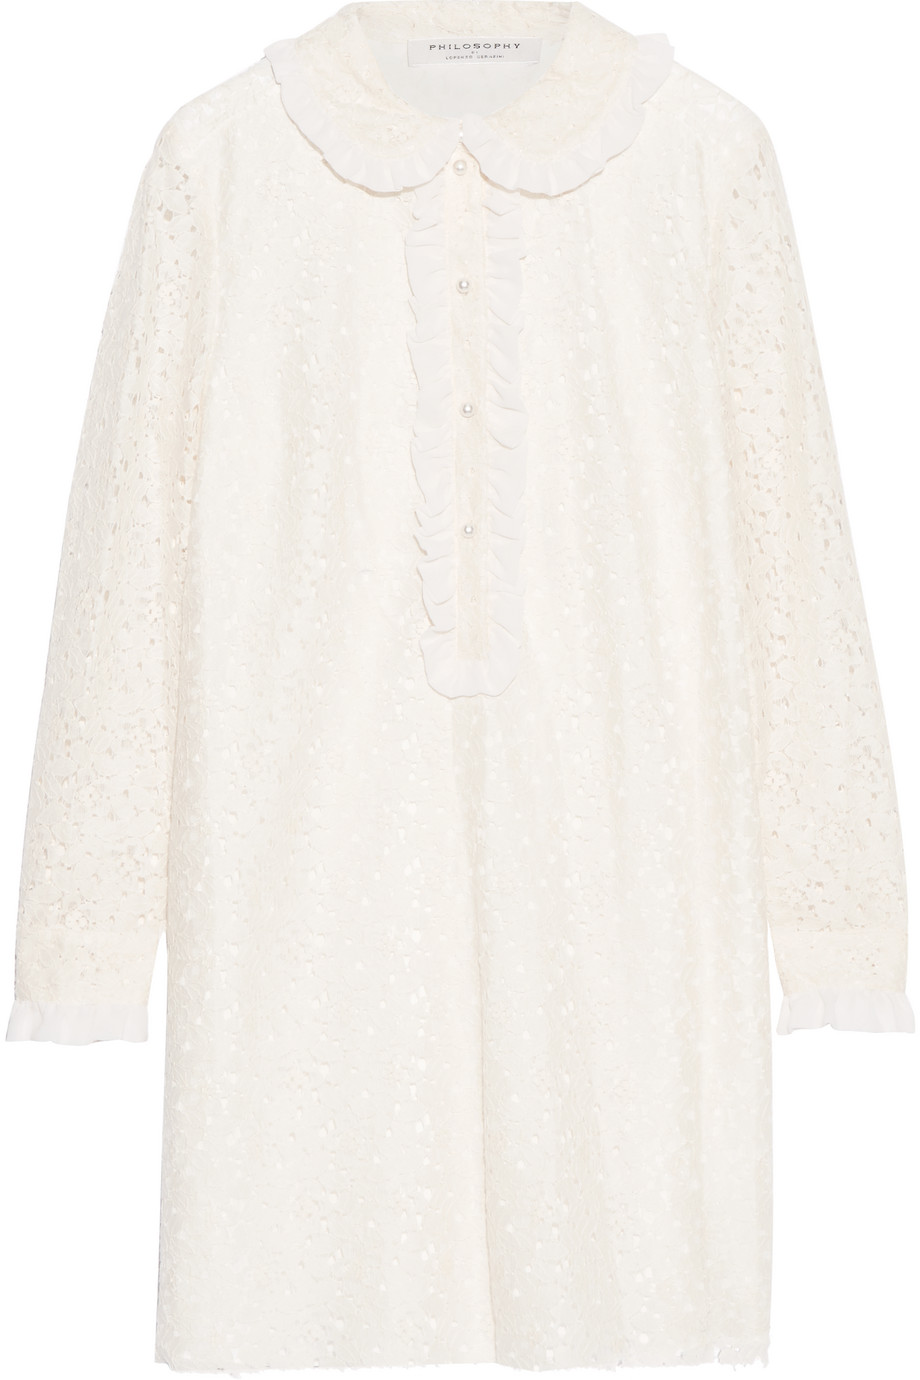 Ruffled Chiffon-Trimmed Corded Lace Mini Dress, Cream, Women's, Size: 38